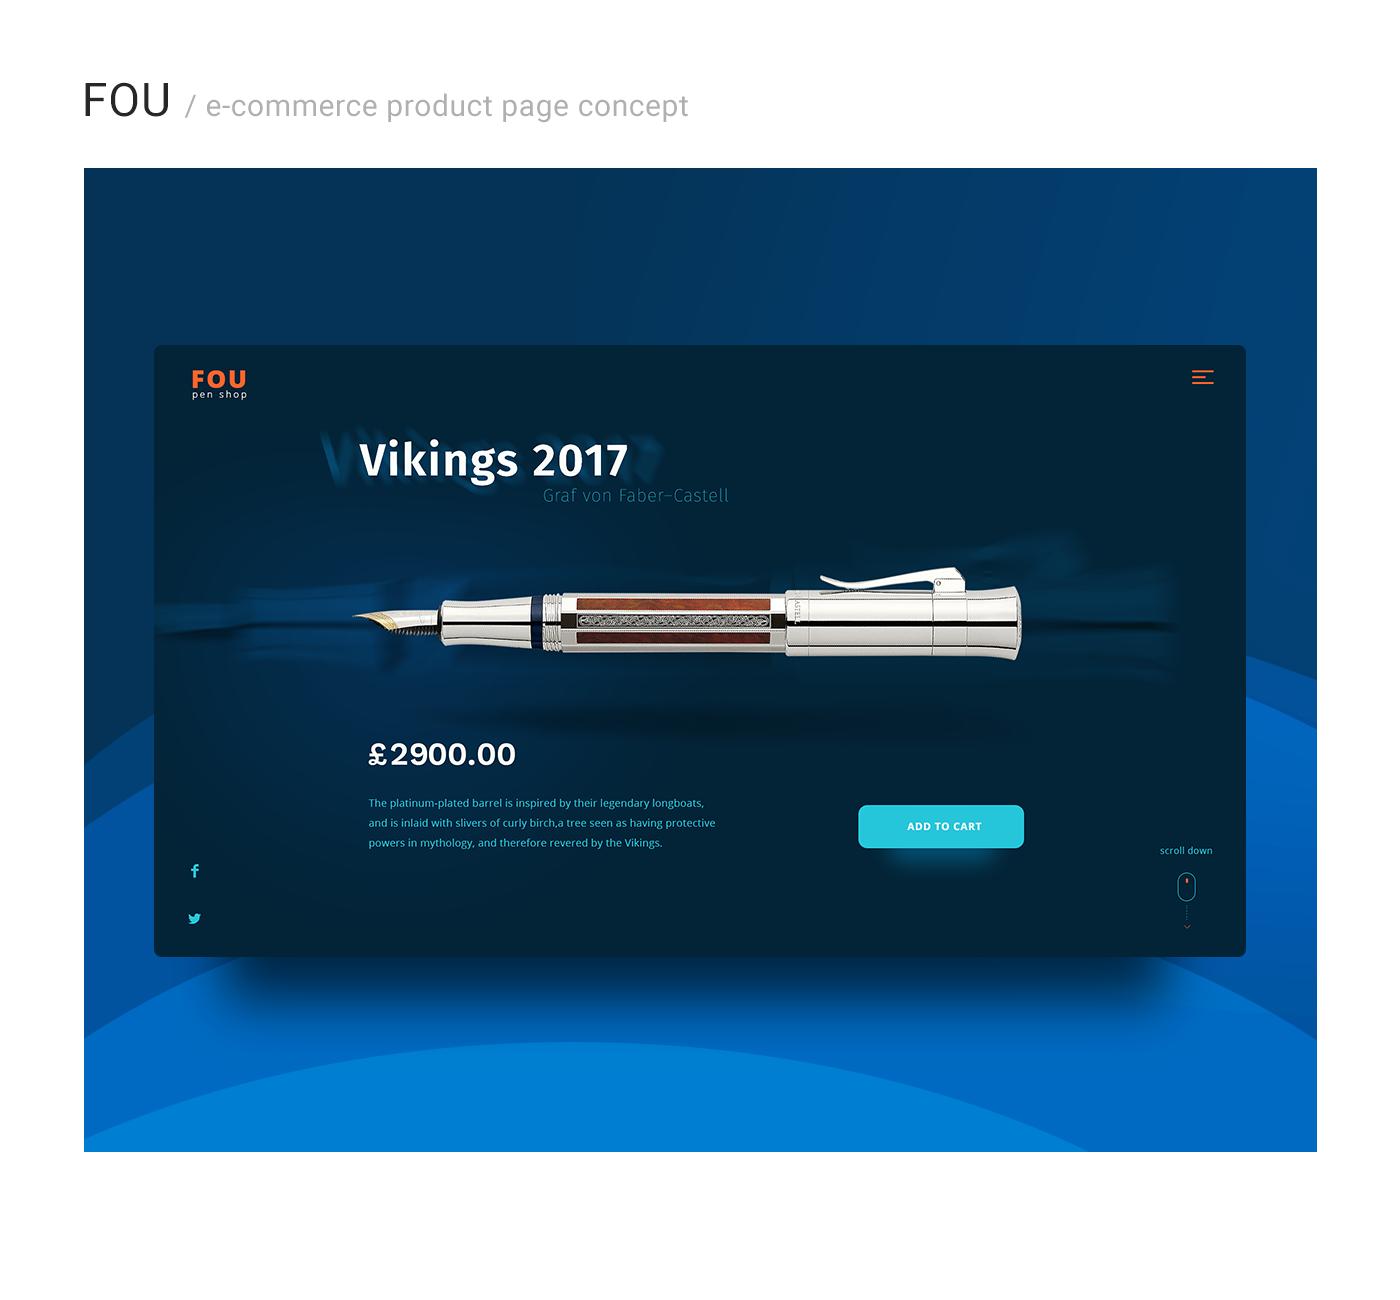 Website uidesign Webdesign Product Page UI Interface Ecommerce